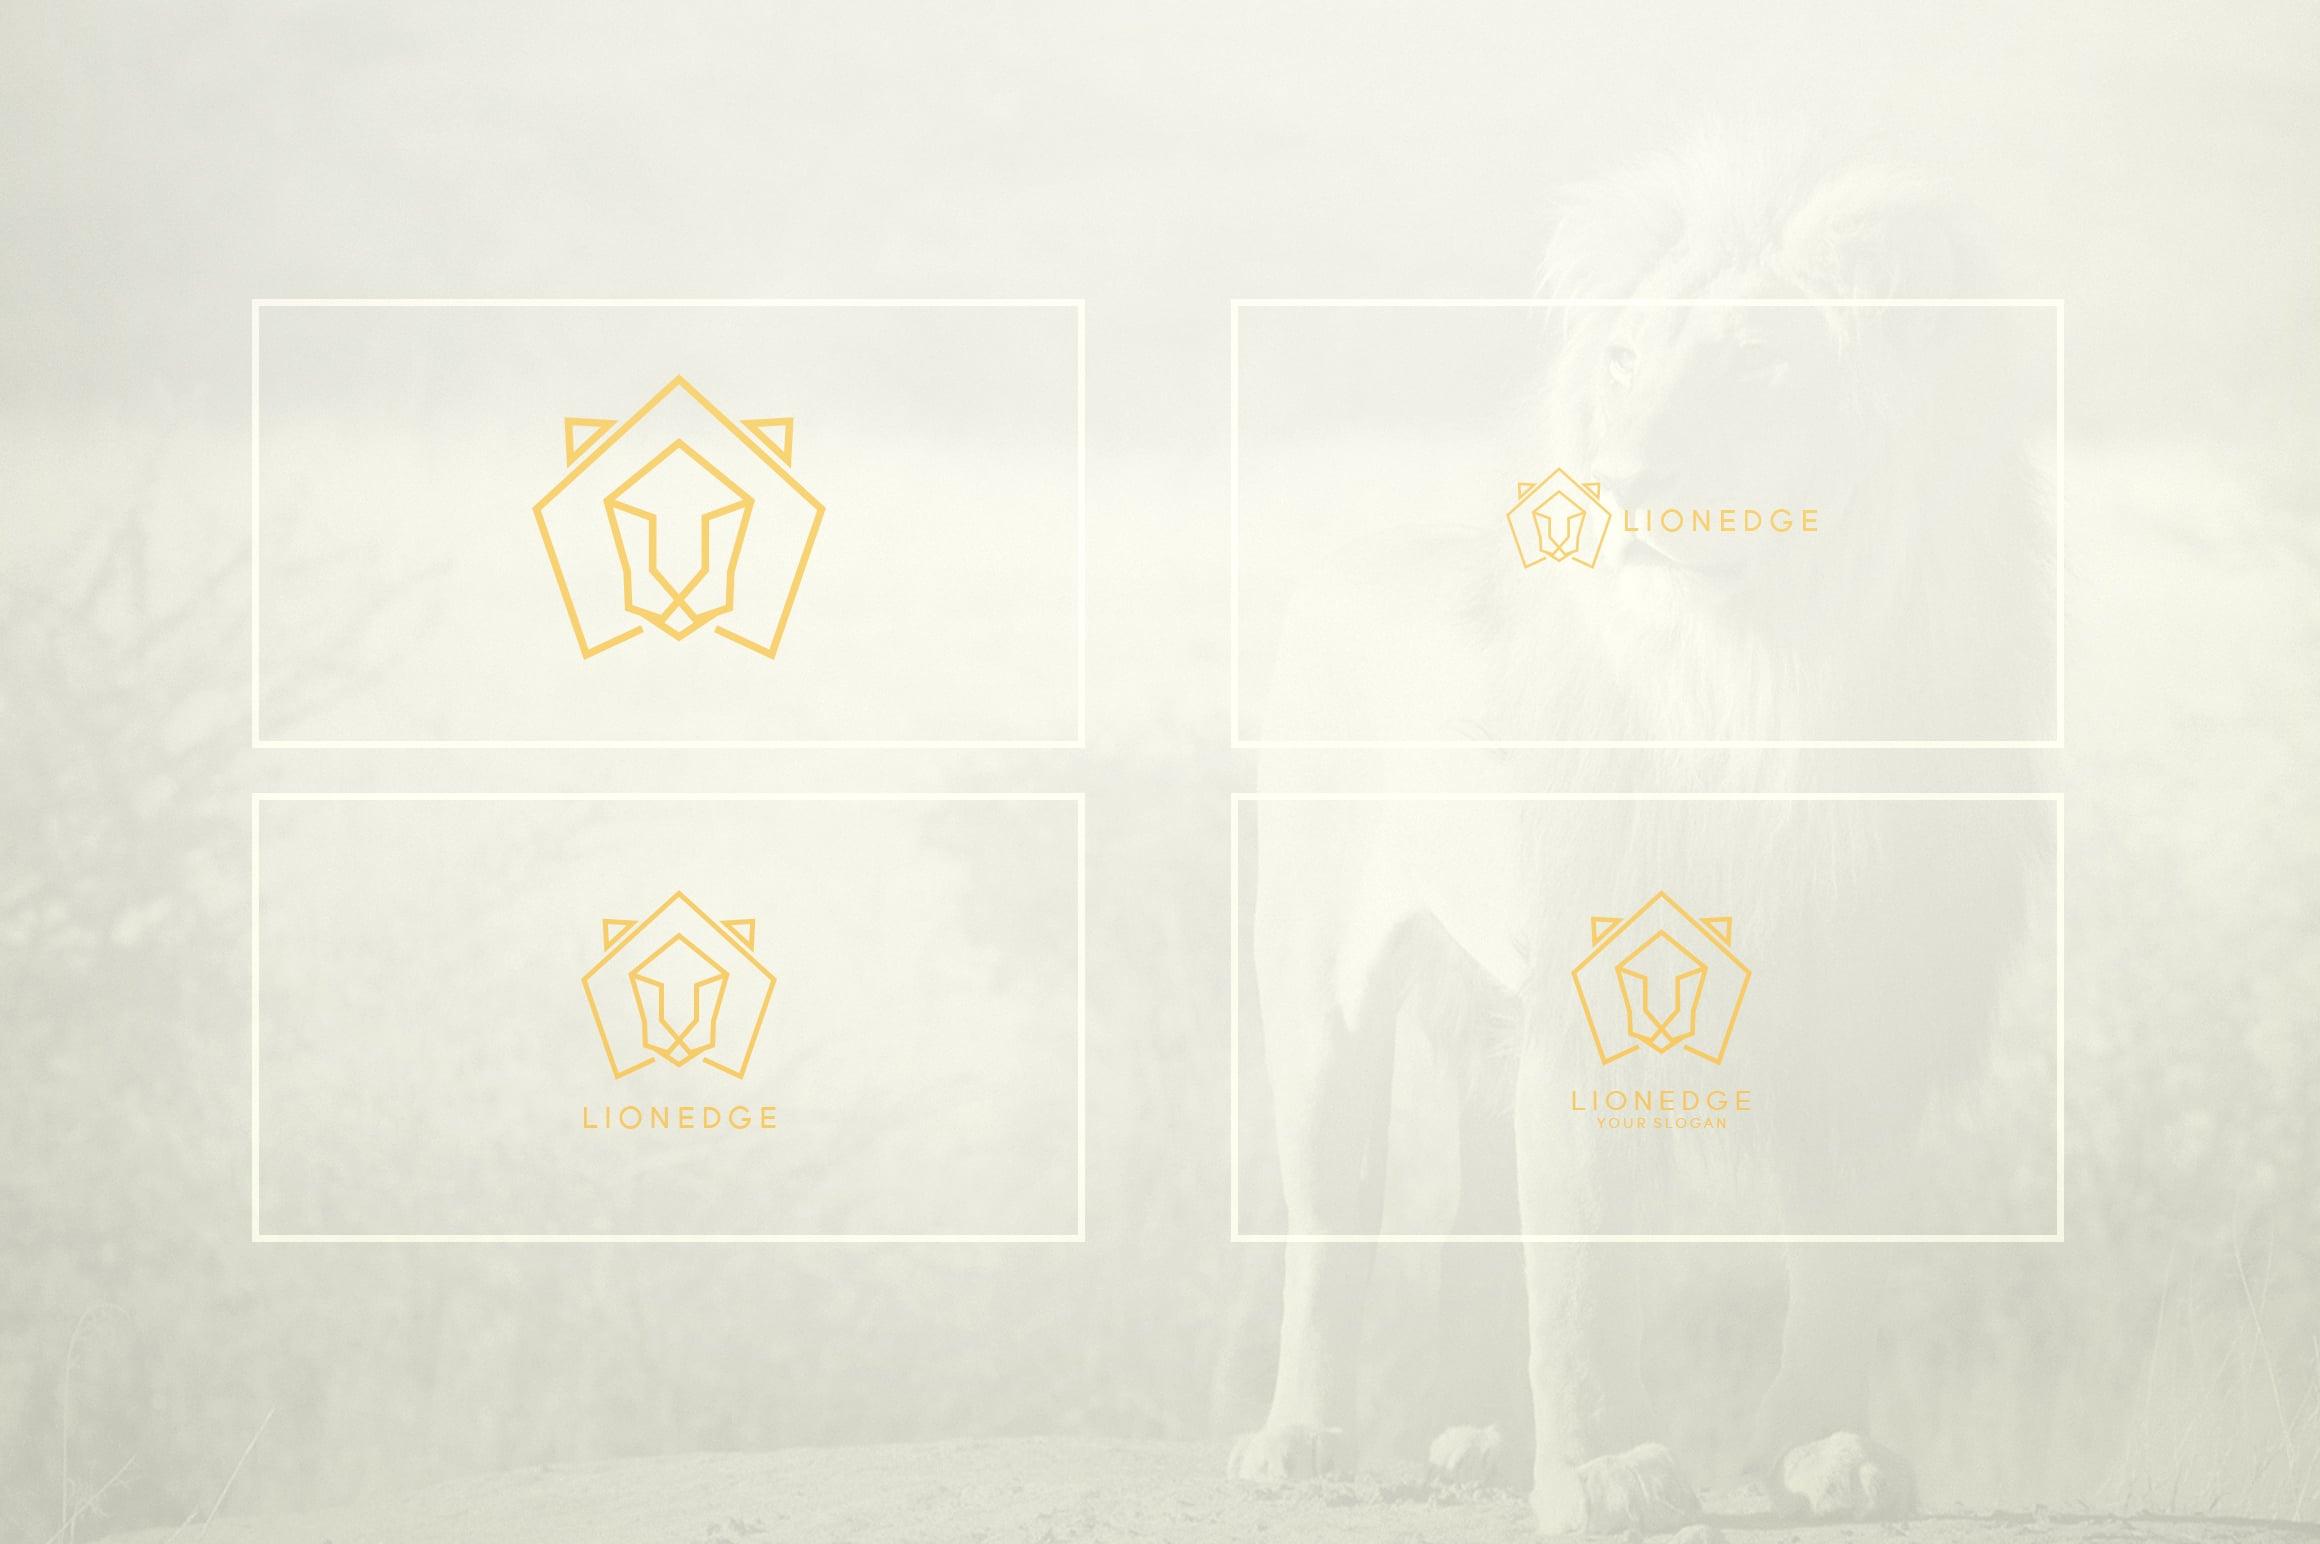 17 Geometric Animal Icons and Logos - 18